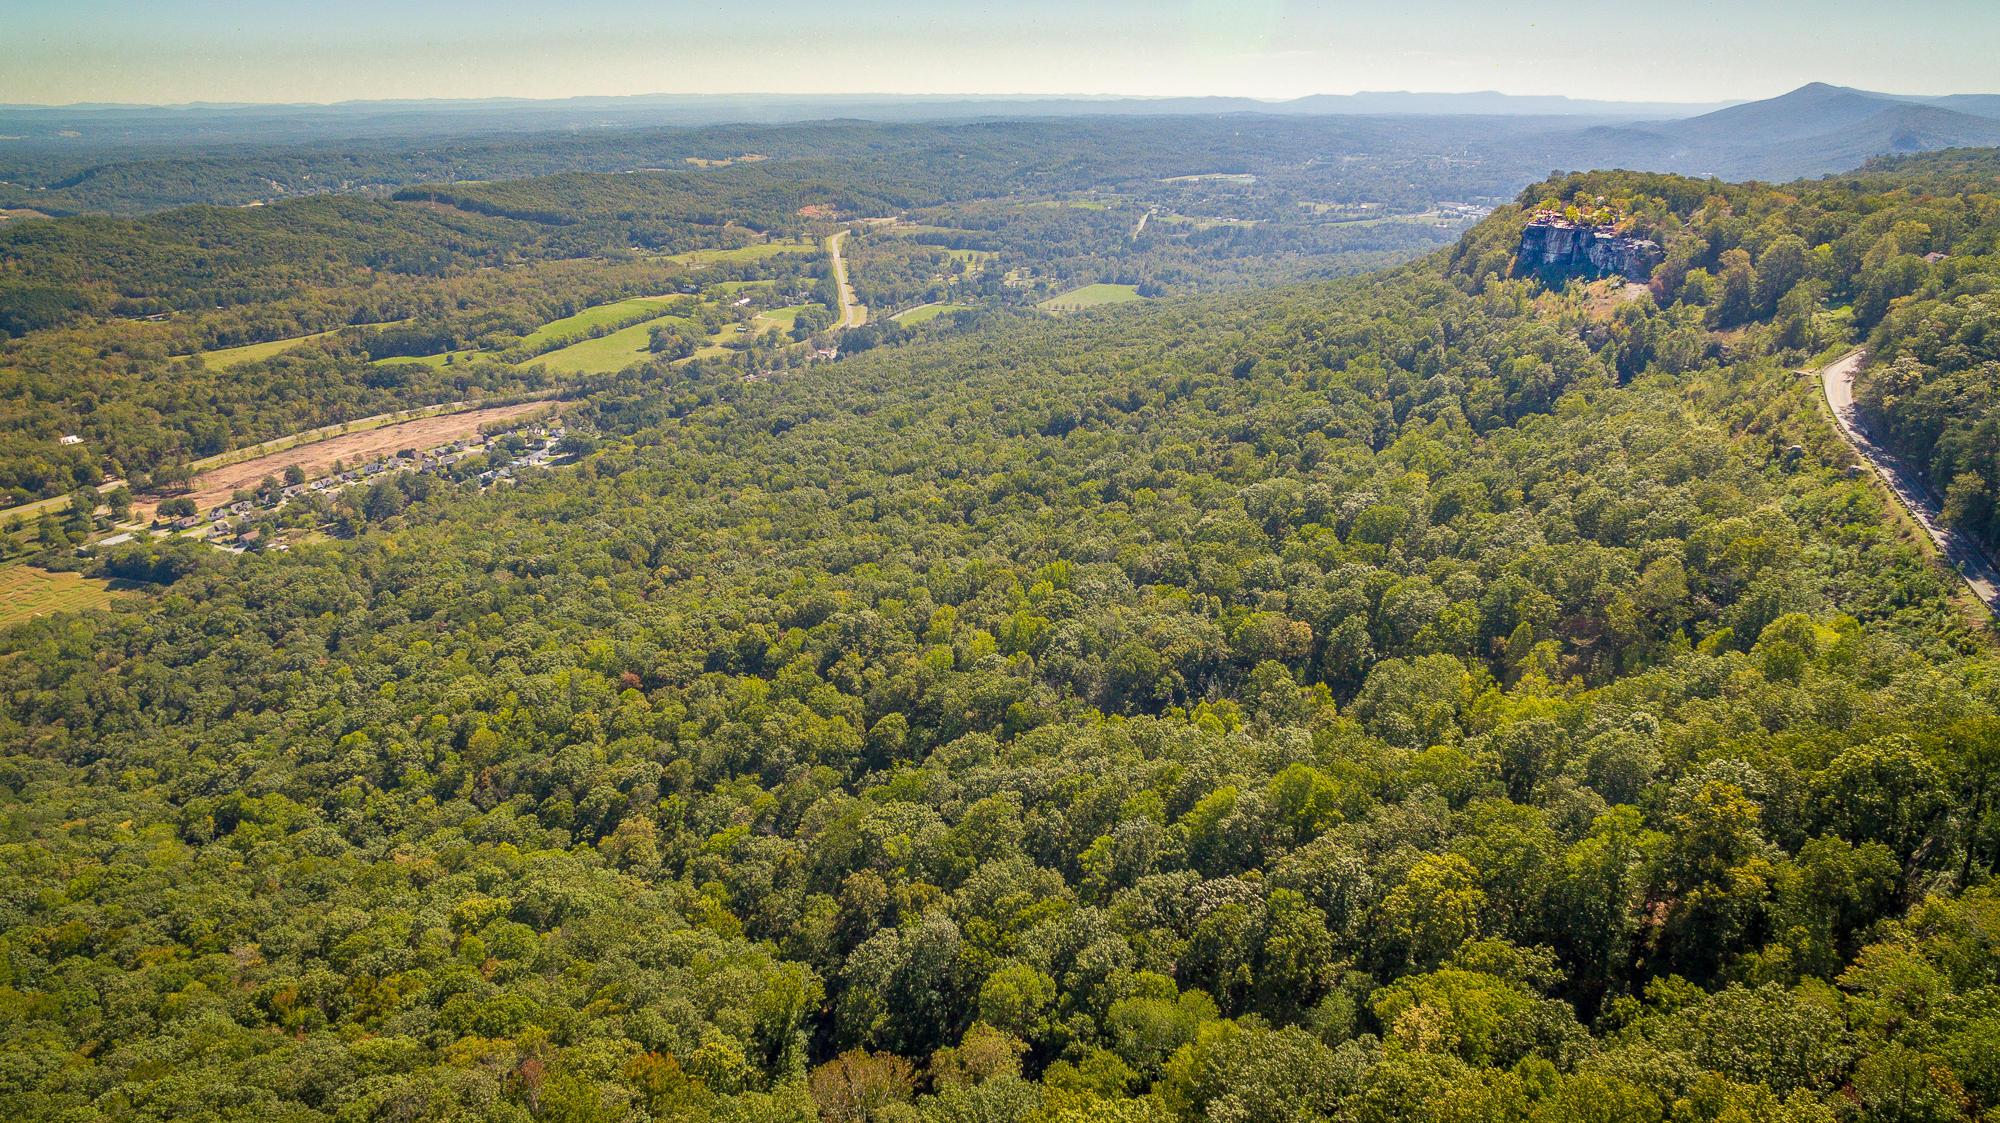 237 Gnome Tr, Lookout Mountain, GA 30750